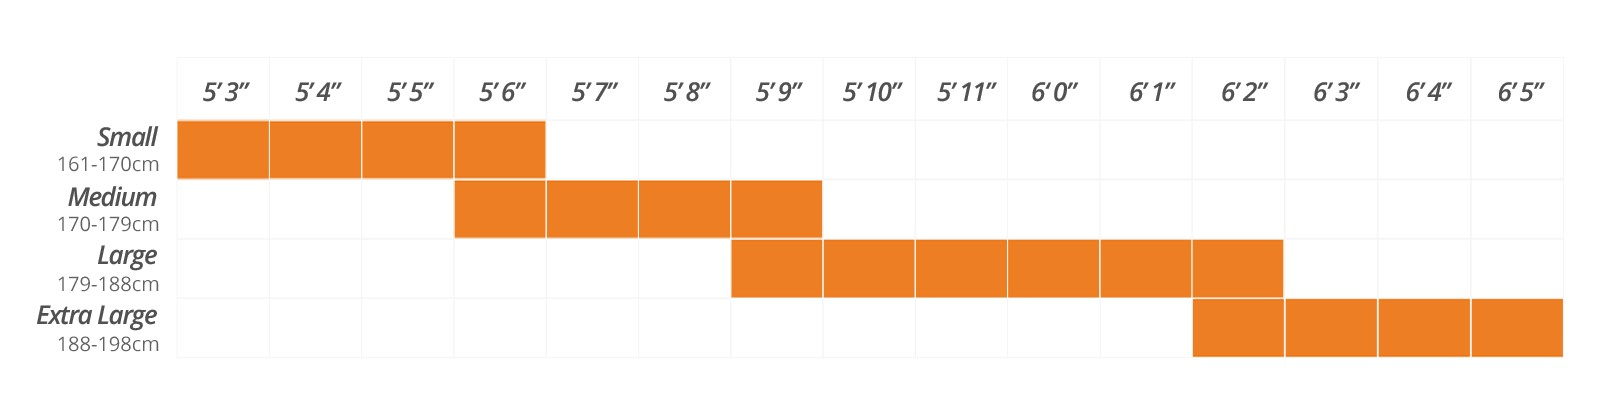 eBike size chart